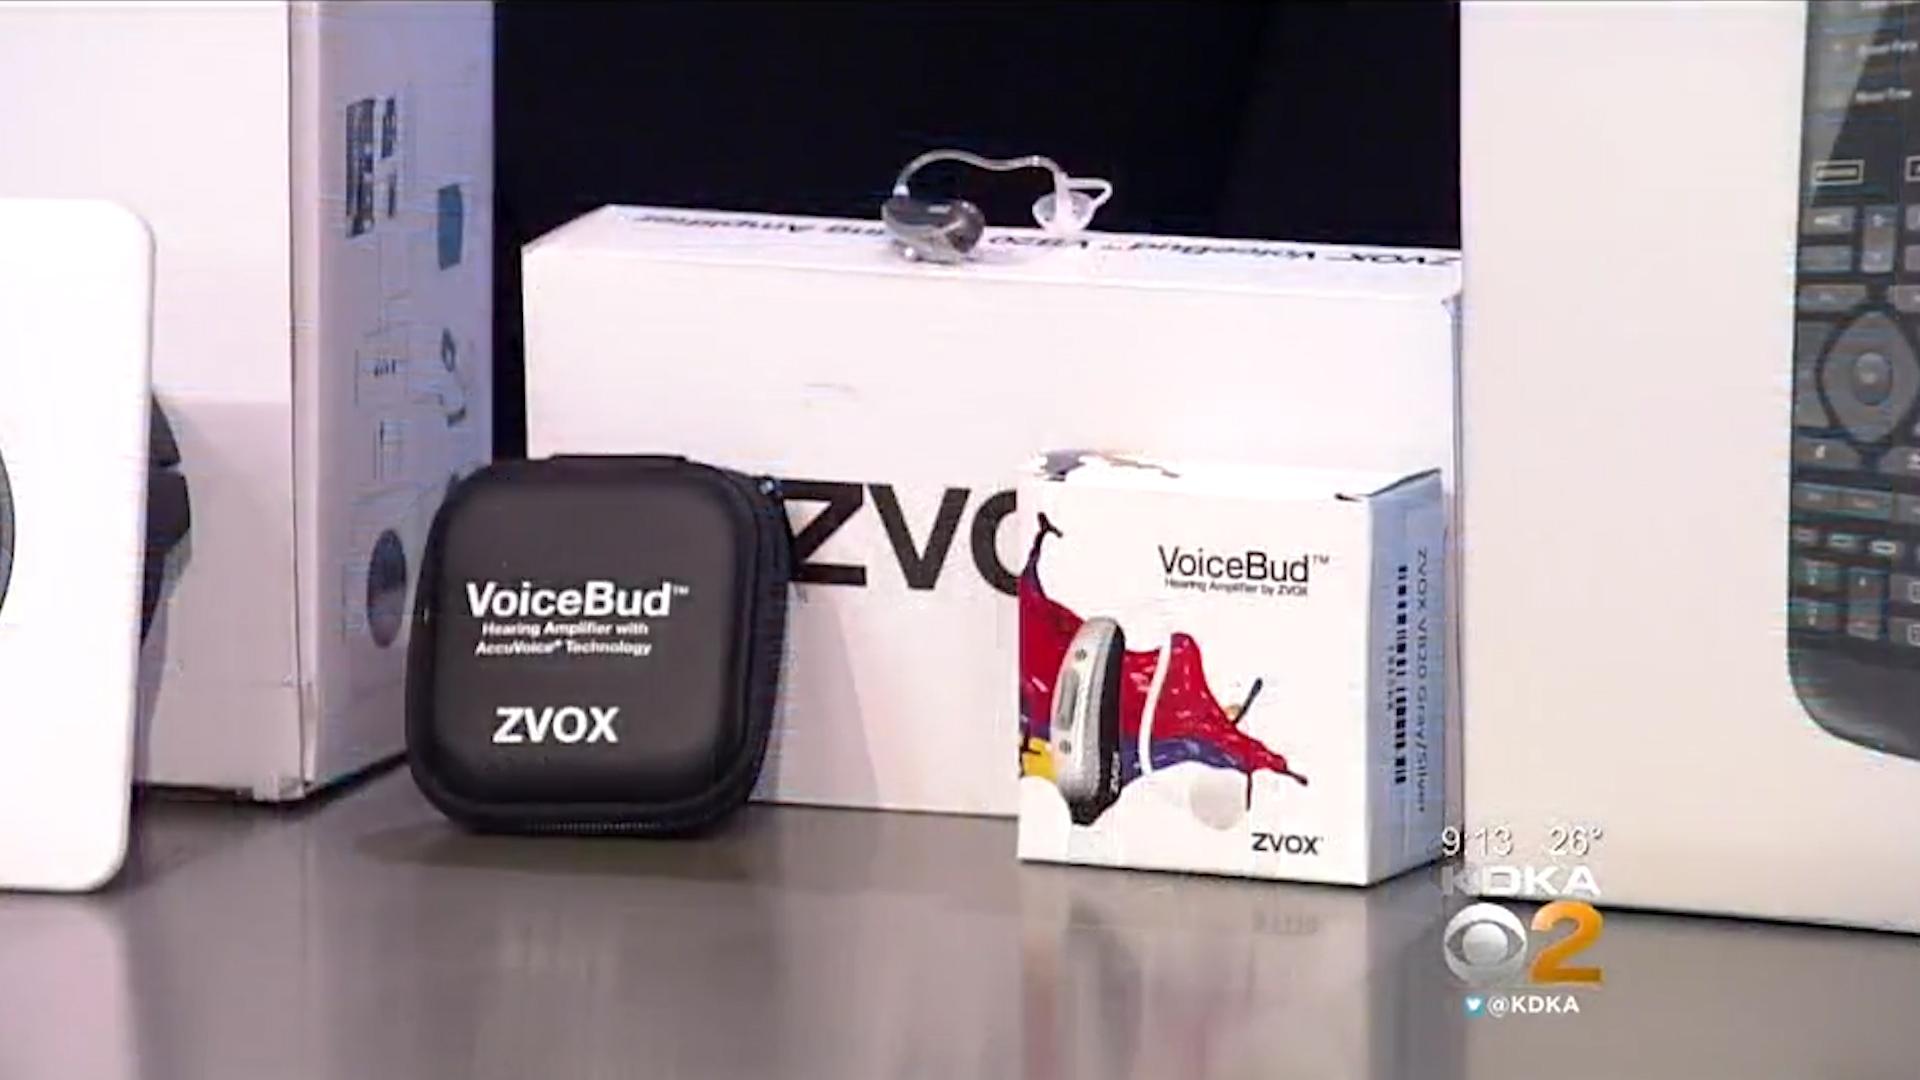 ZVOX VoiceBud VB20 Hearing Amplifiers Dual-Microphone FDA Registered - $299.99 eachShop Now